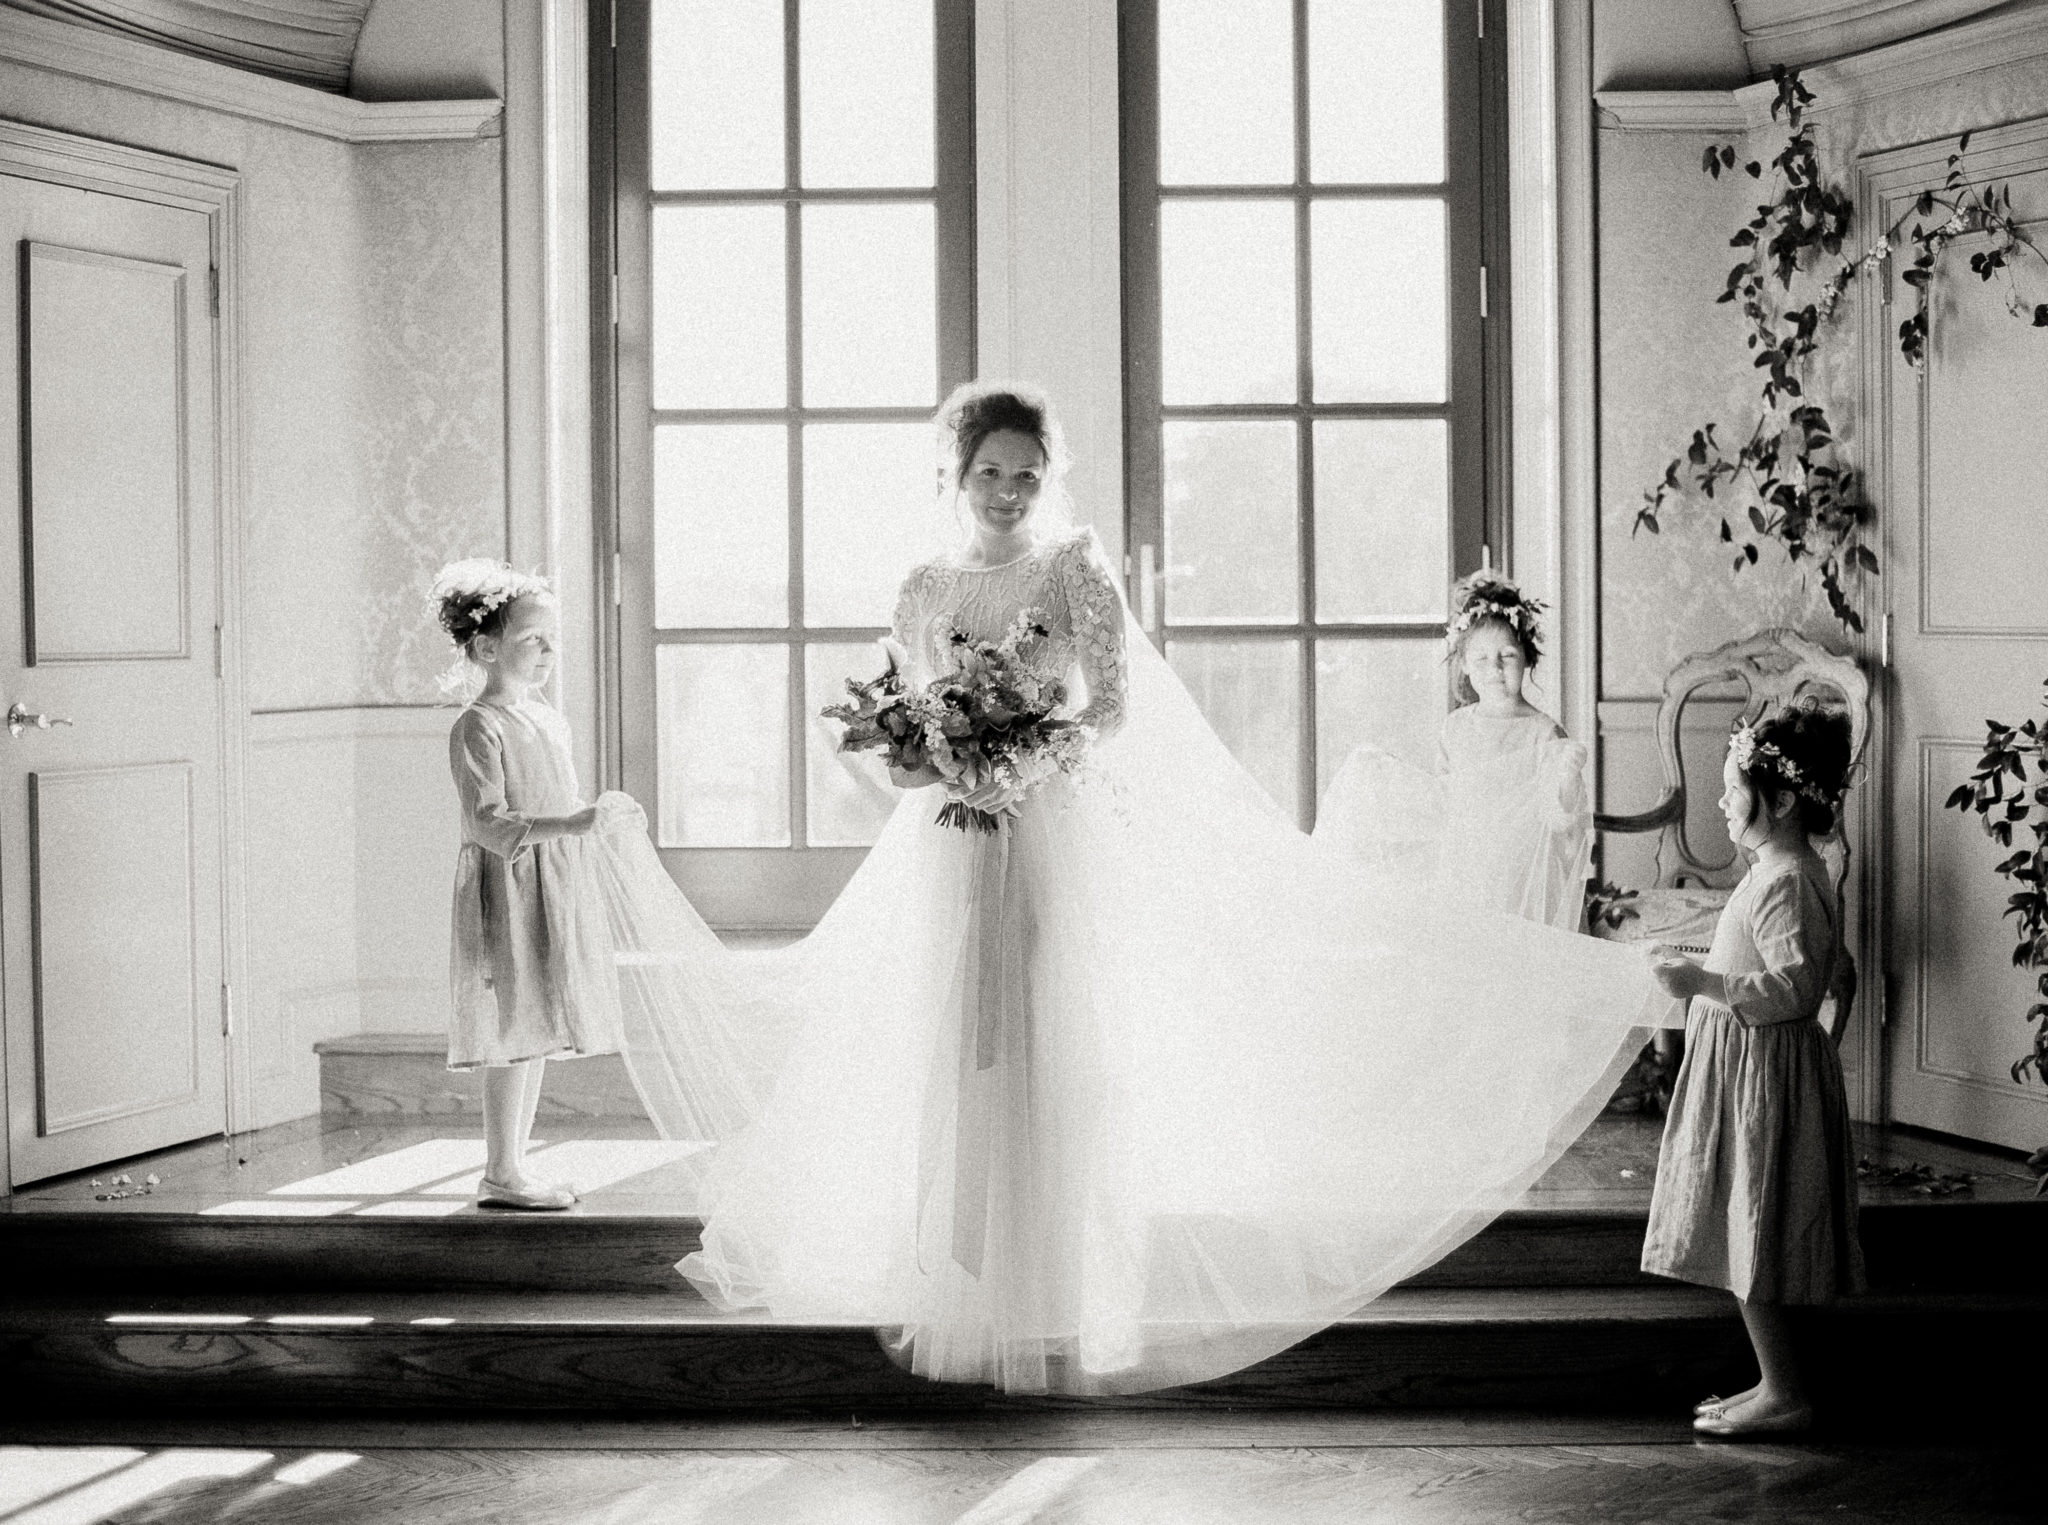 Chana Marelus real bride wearing the Rose